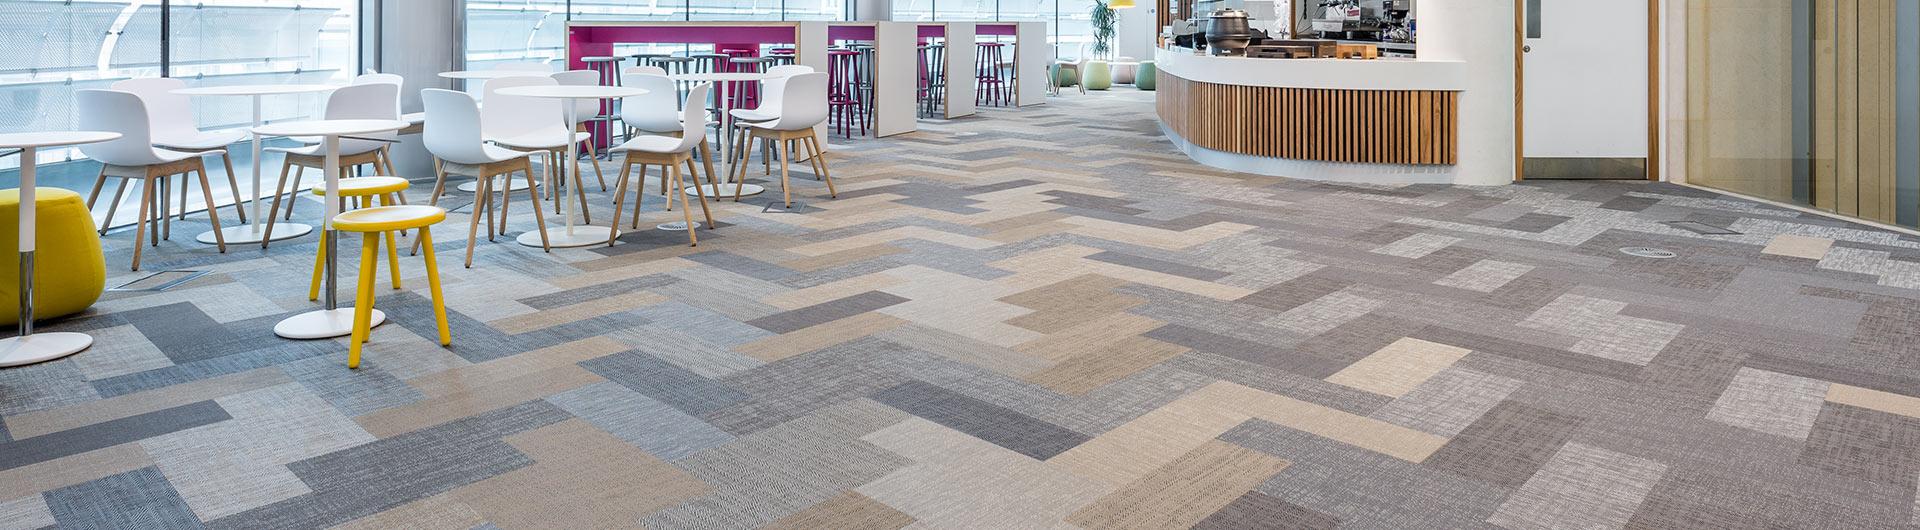 bolon_flooring_office_cima1_uk